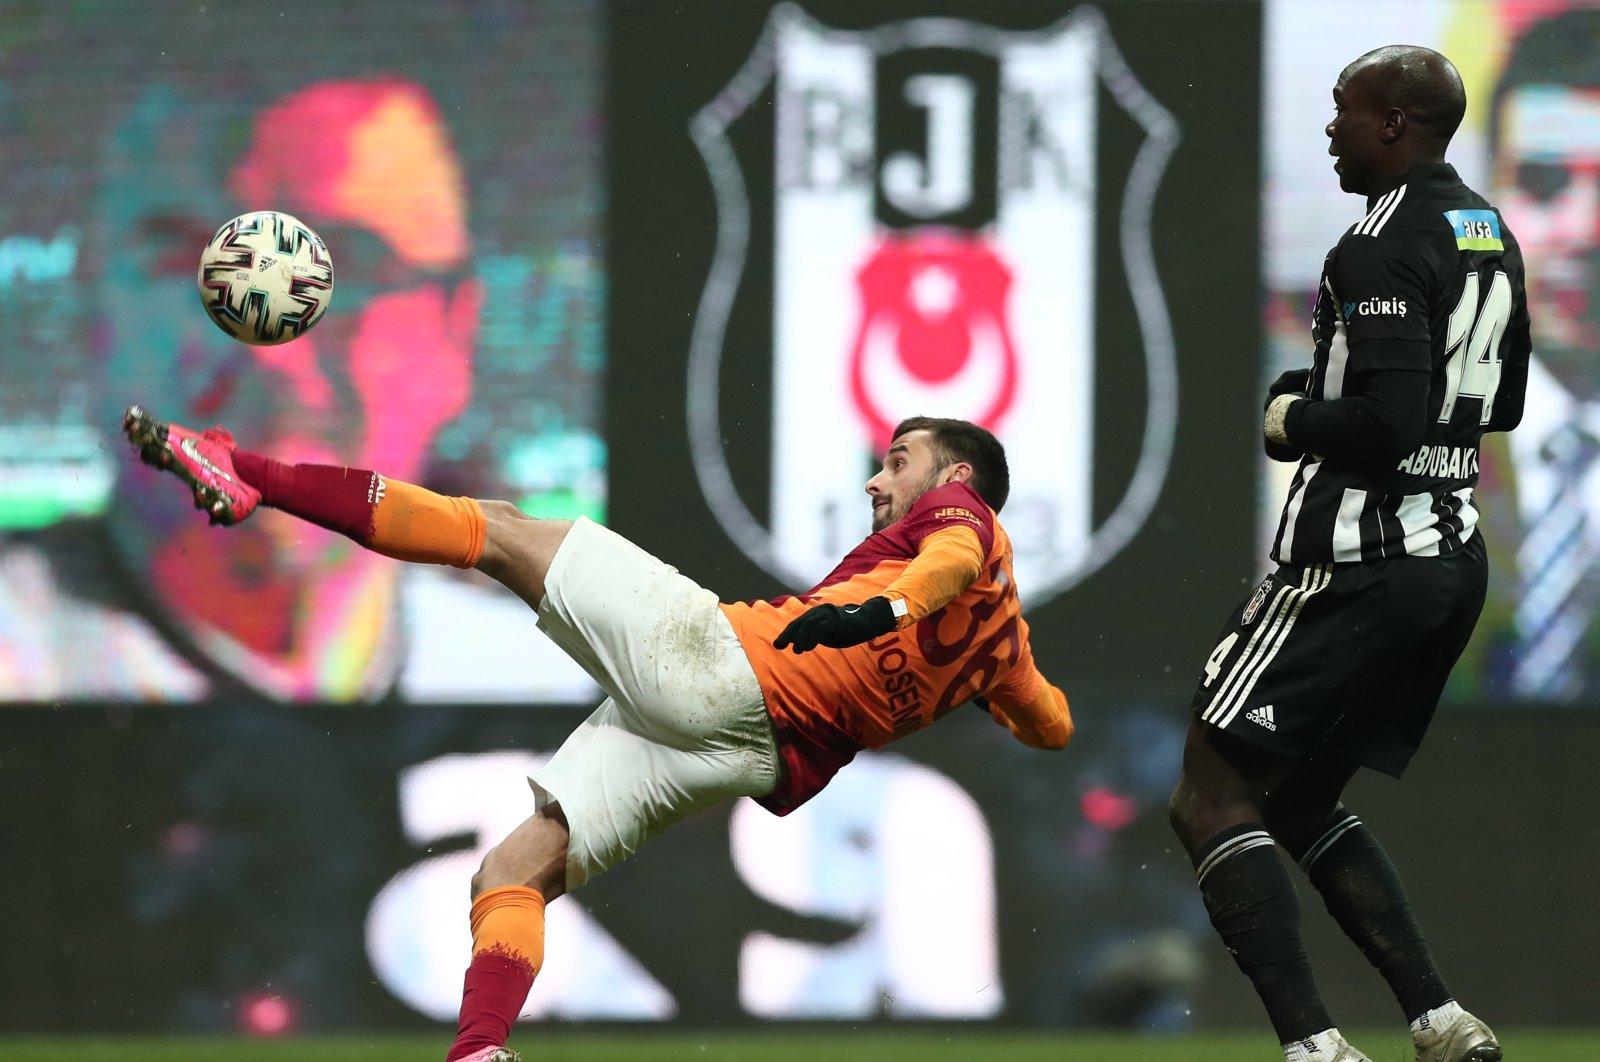 Galatasaray left back Marcelo Saracchi (L) in action against Beşiktaş forward Vincent Aboubakar in a Turkish Süper Lig match, Istanbul, Turkey, Jan. 17, 2021. (EPA Photo)